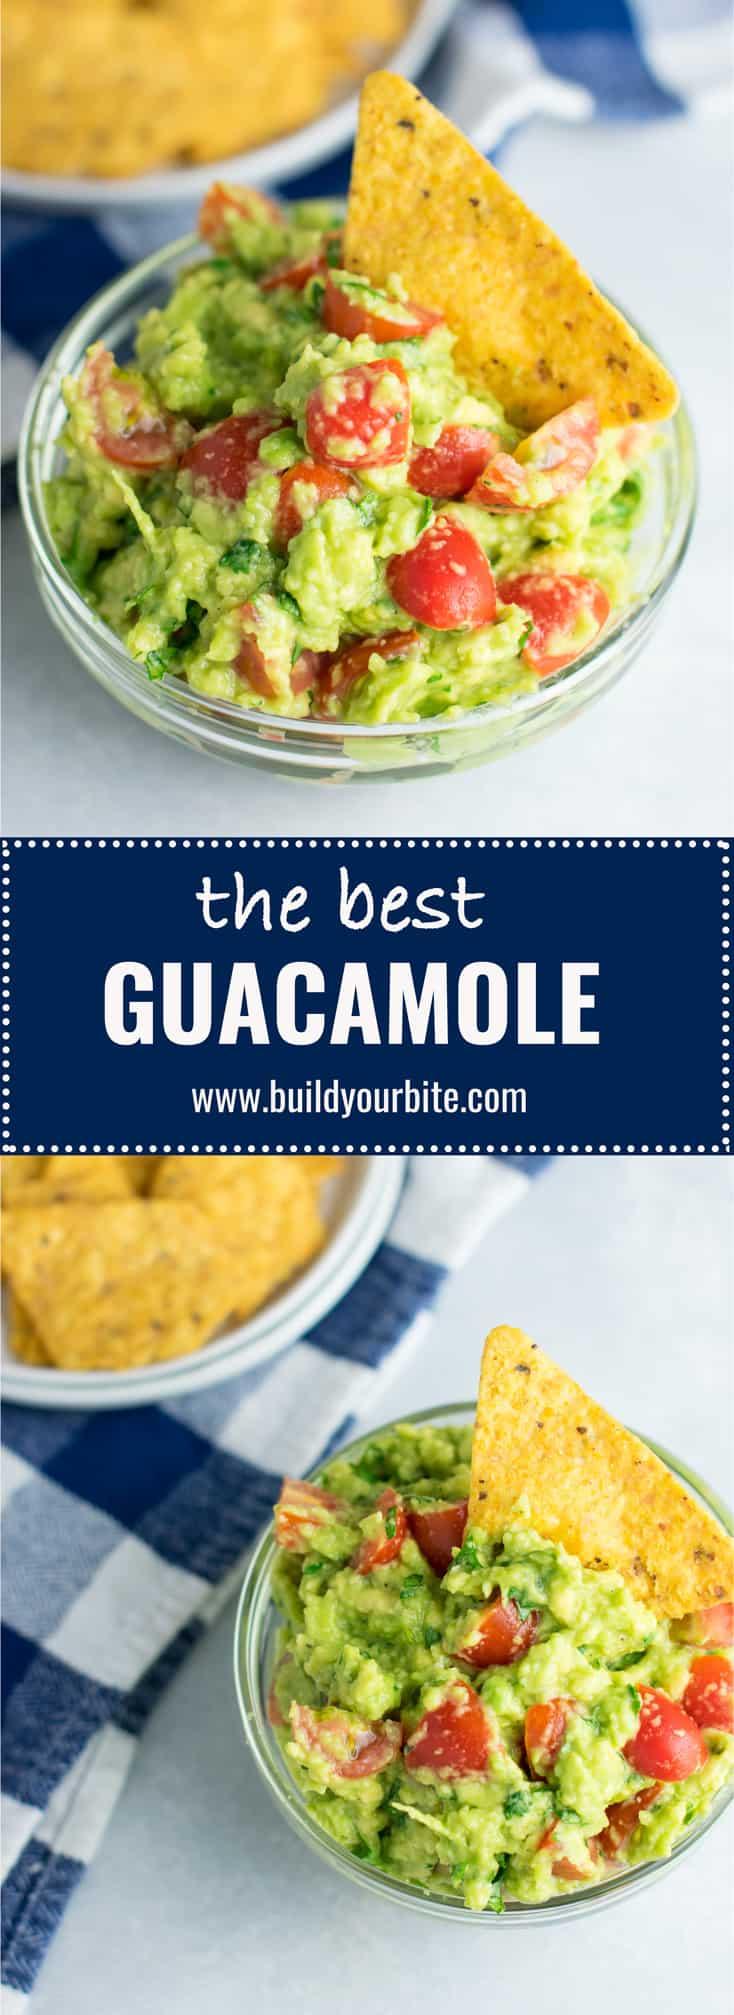 The best guacamole recipe with cherry tomatoes. #vegan #guacamole #bestguacamole #appetizers #gamedayfood